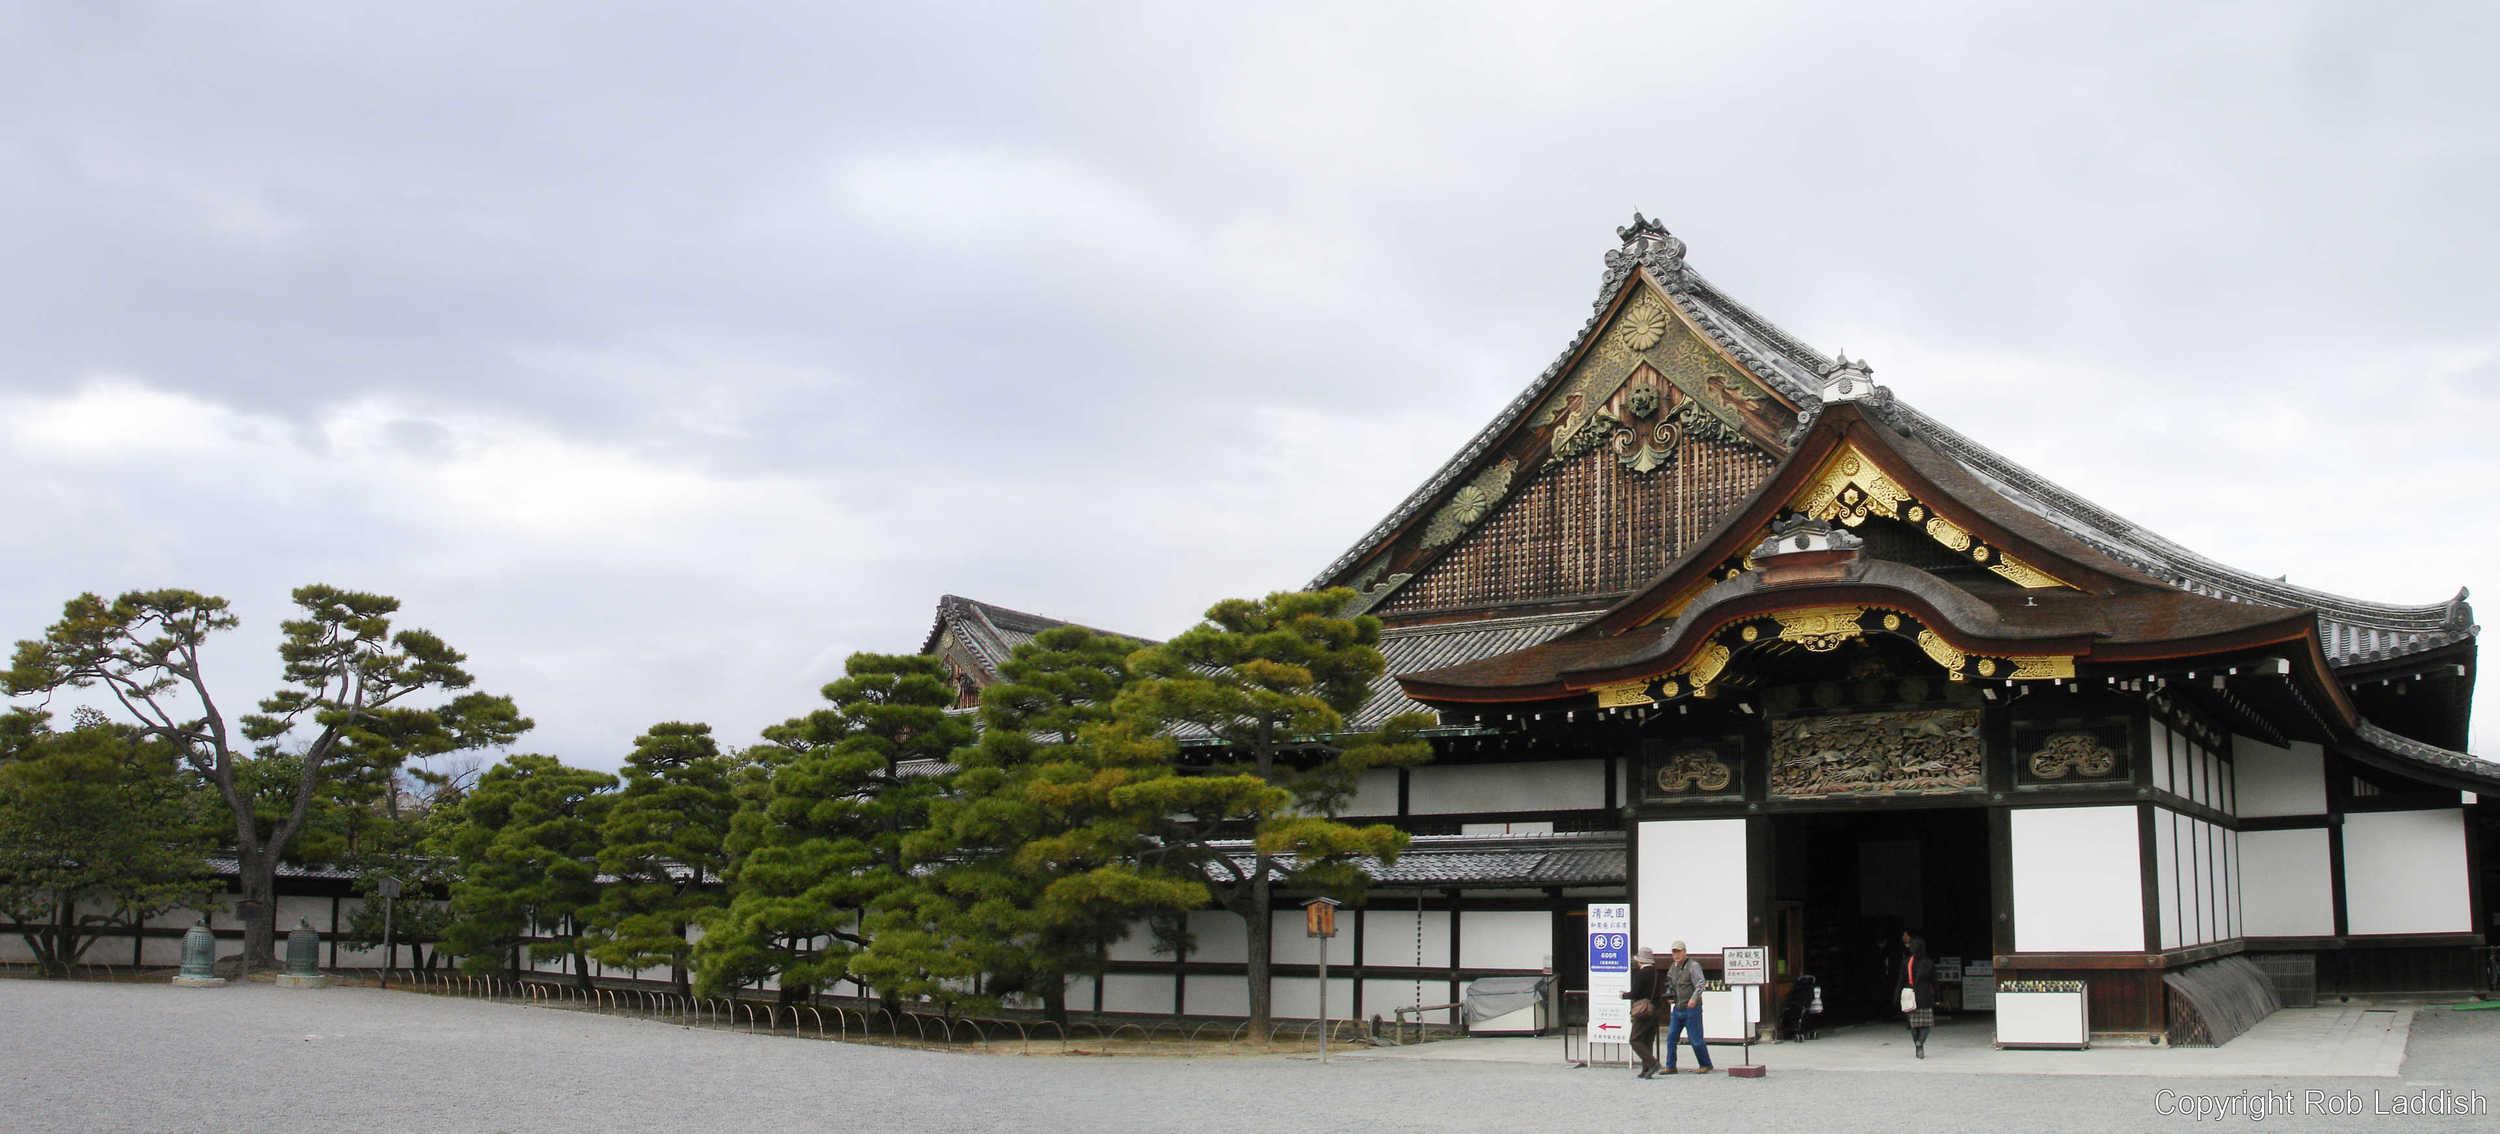 2005_1130_14.29d. Panorama of Nijo Castle Entrance (2 pics).jpg